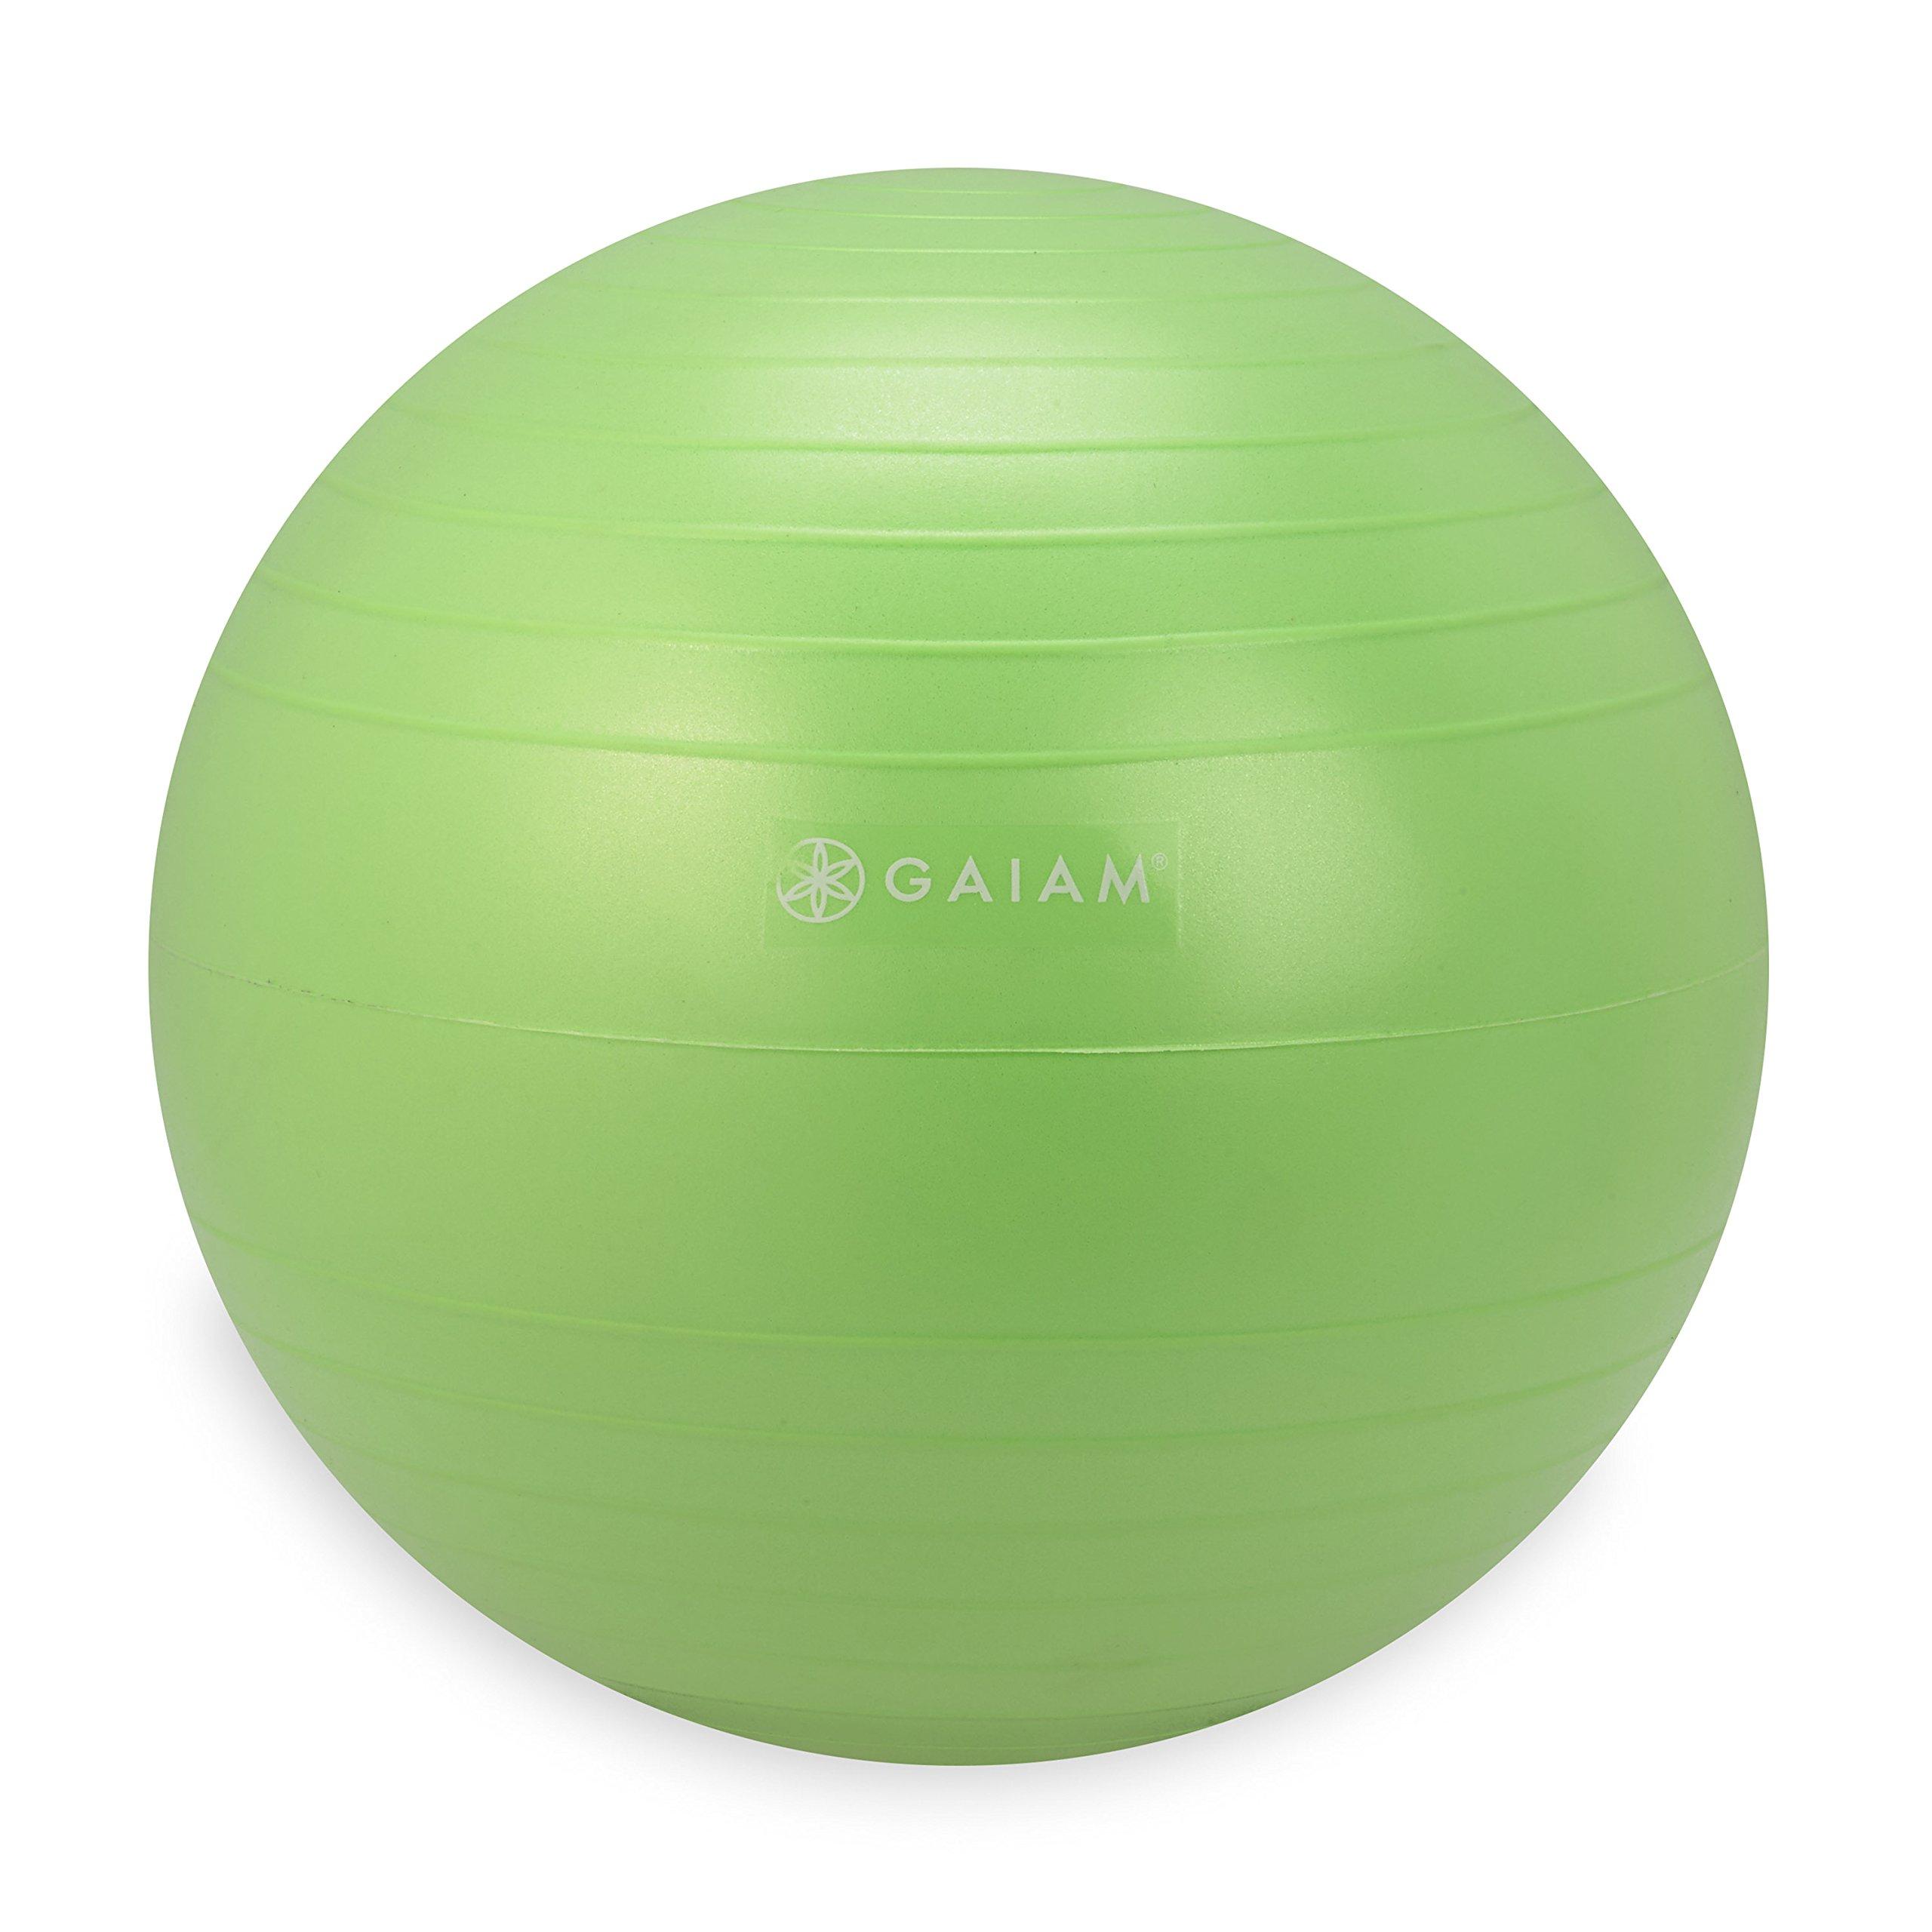 Gaiam Kids Balance Ball Chair Ball - Extra Balance Ball for Kids Balance Ball Chair, Green, 38cm